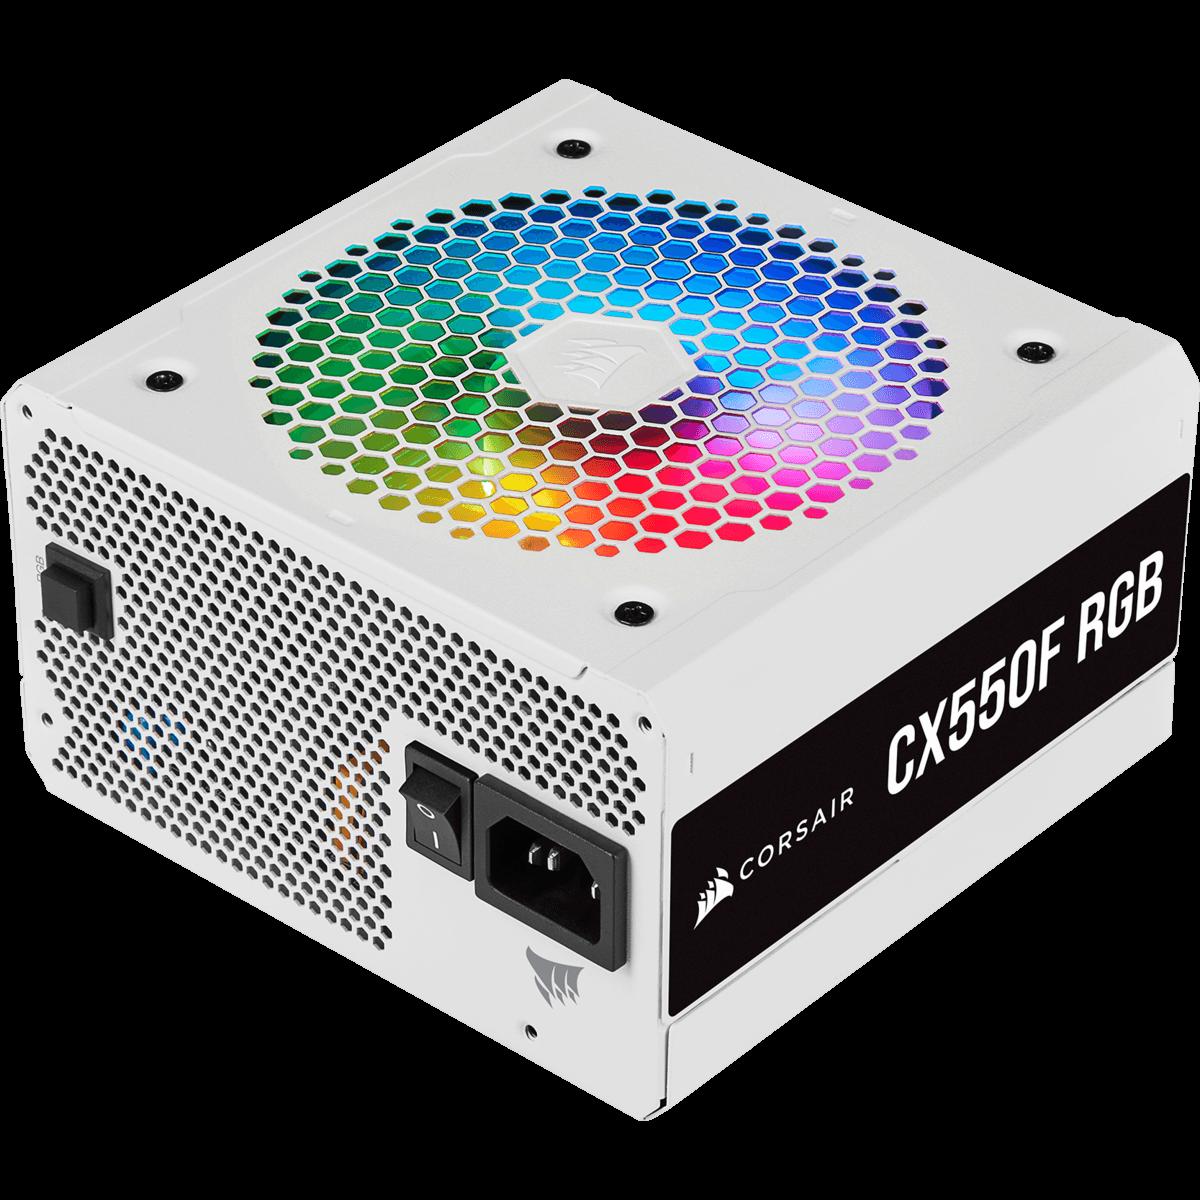 Fonte Corsair CX550F RGB 550W, White, 80 Plus Bronze, CP-9020225-BR